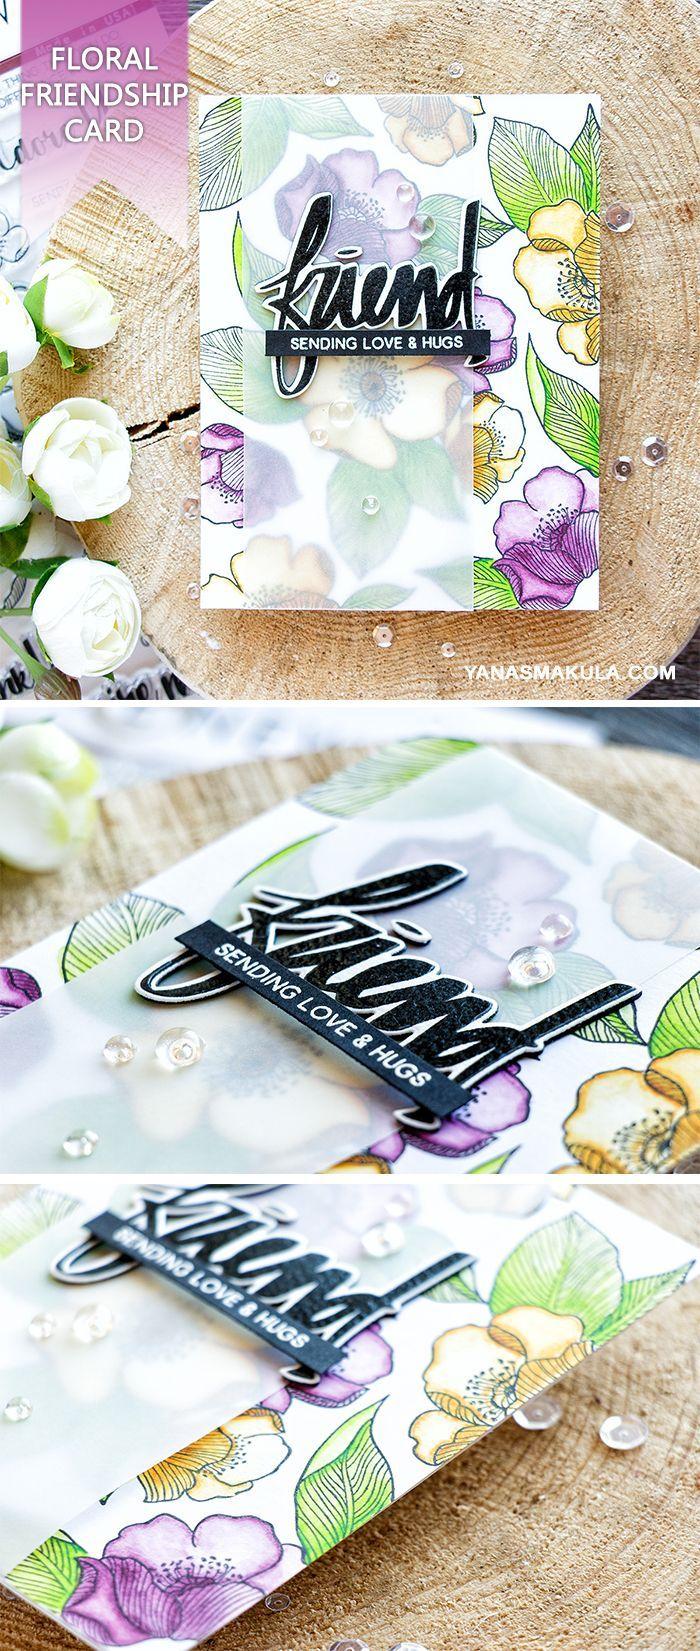 Create a beautiful floral friendship card using Altenew Adore You & Super Script stamp sets. For details, please visit http://www.yanasmakula.com/?p=56117